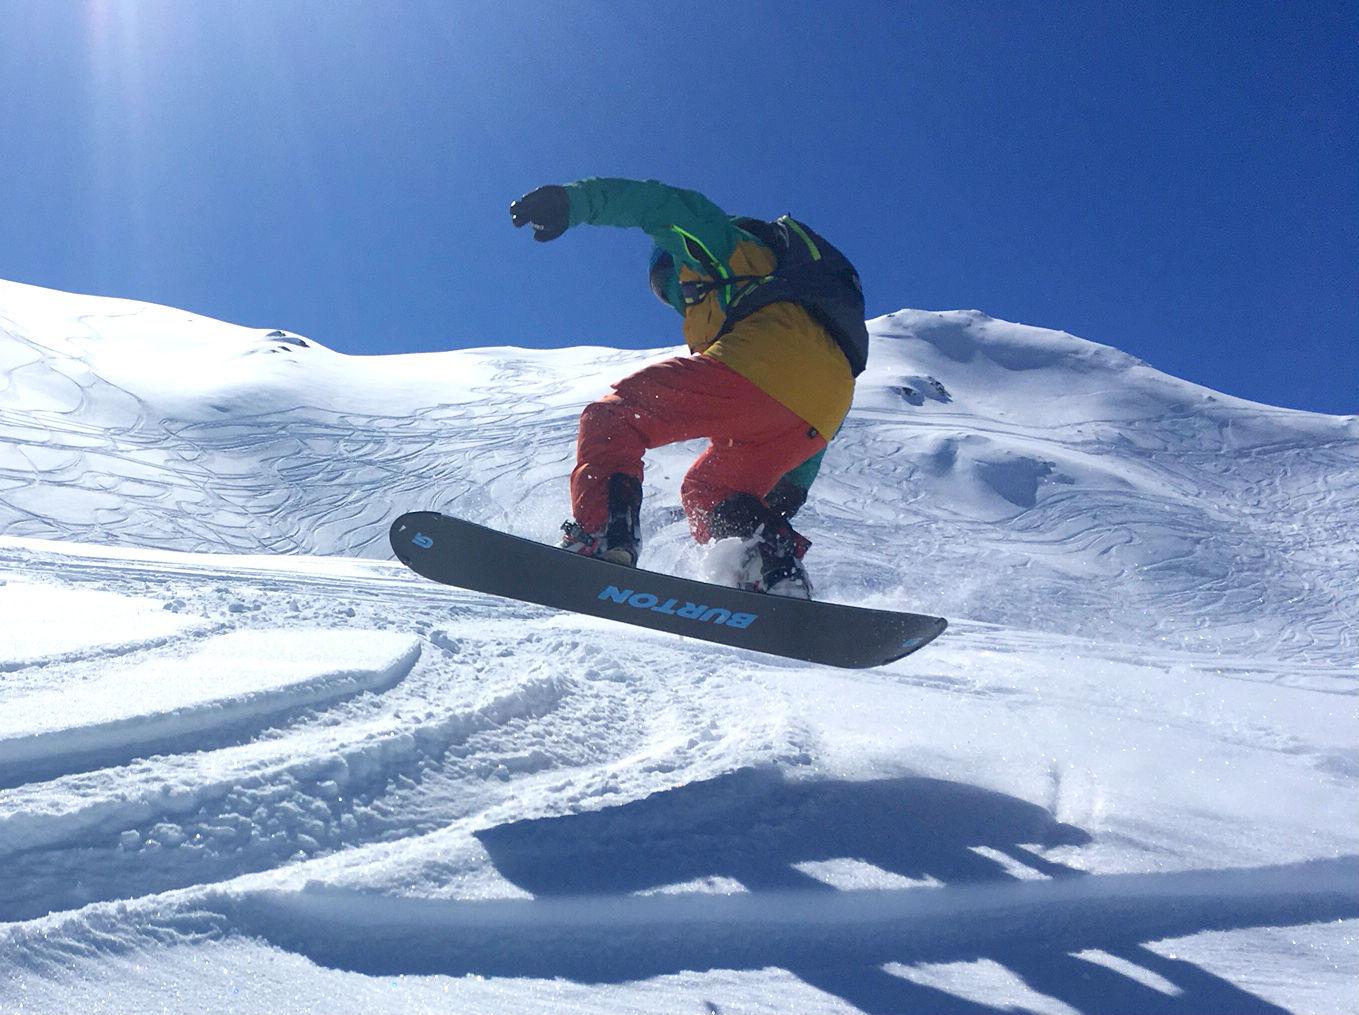 Les Menuires snowboarding review freeride